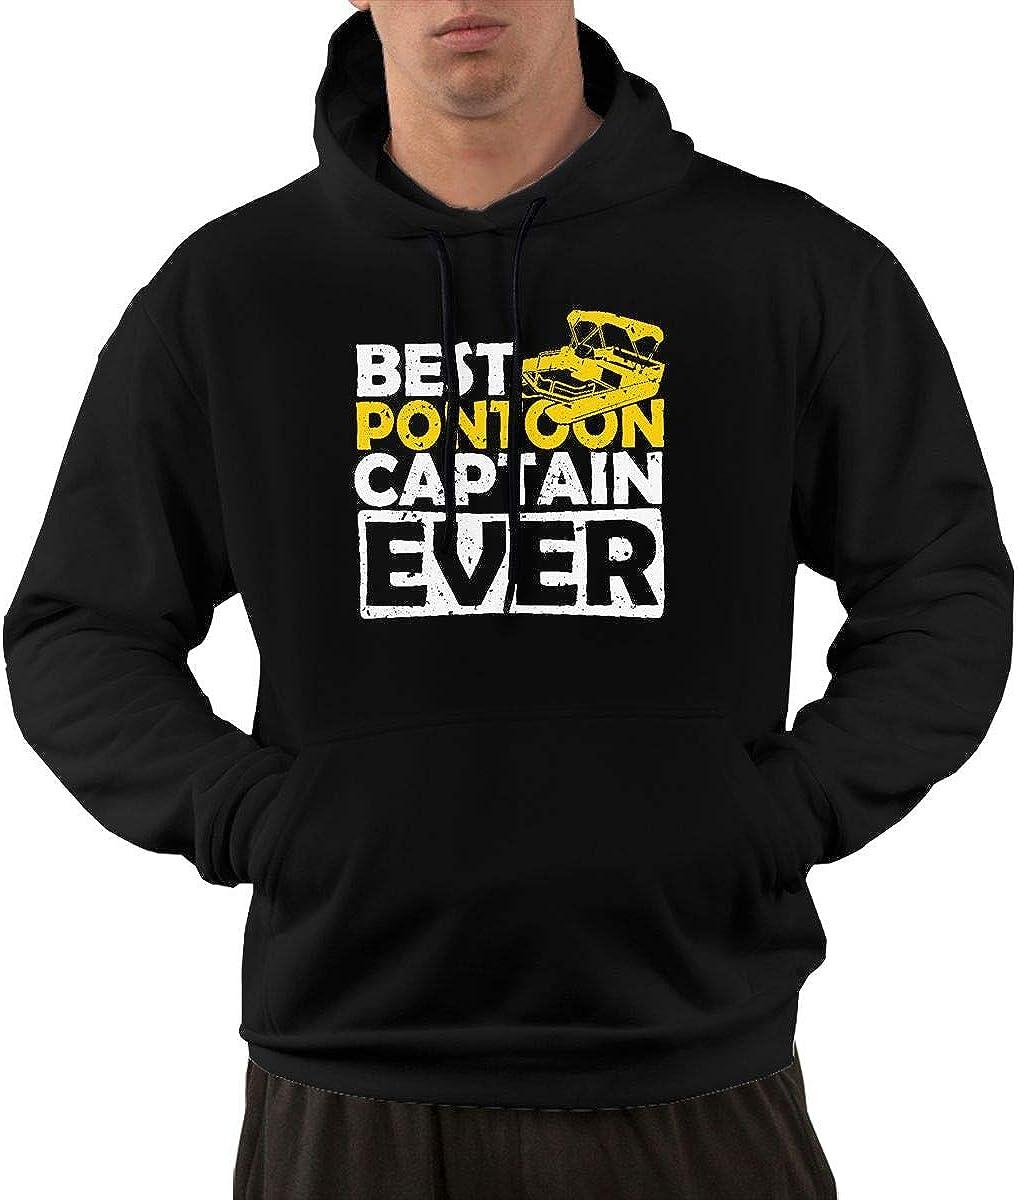 Best Pontoon Captain Ever Pullover Hoodie Sweatshirt Mens Training Bodybuilding Running Hooded Sweatshirt